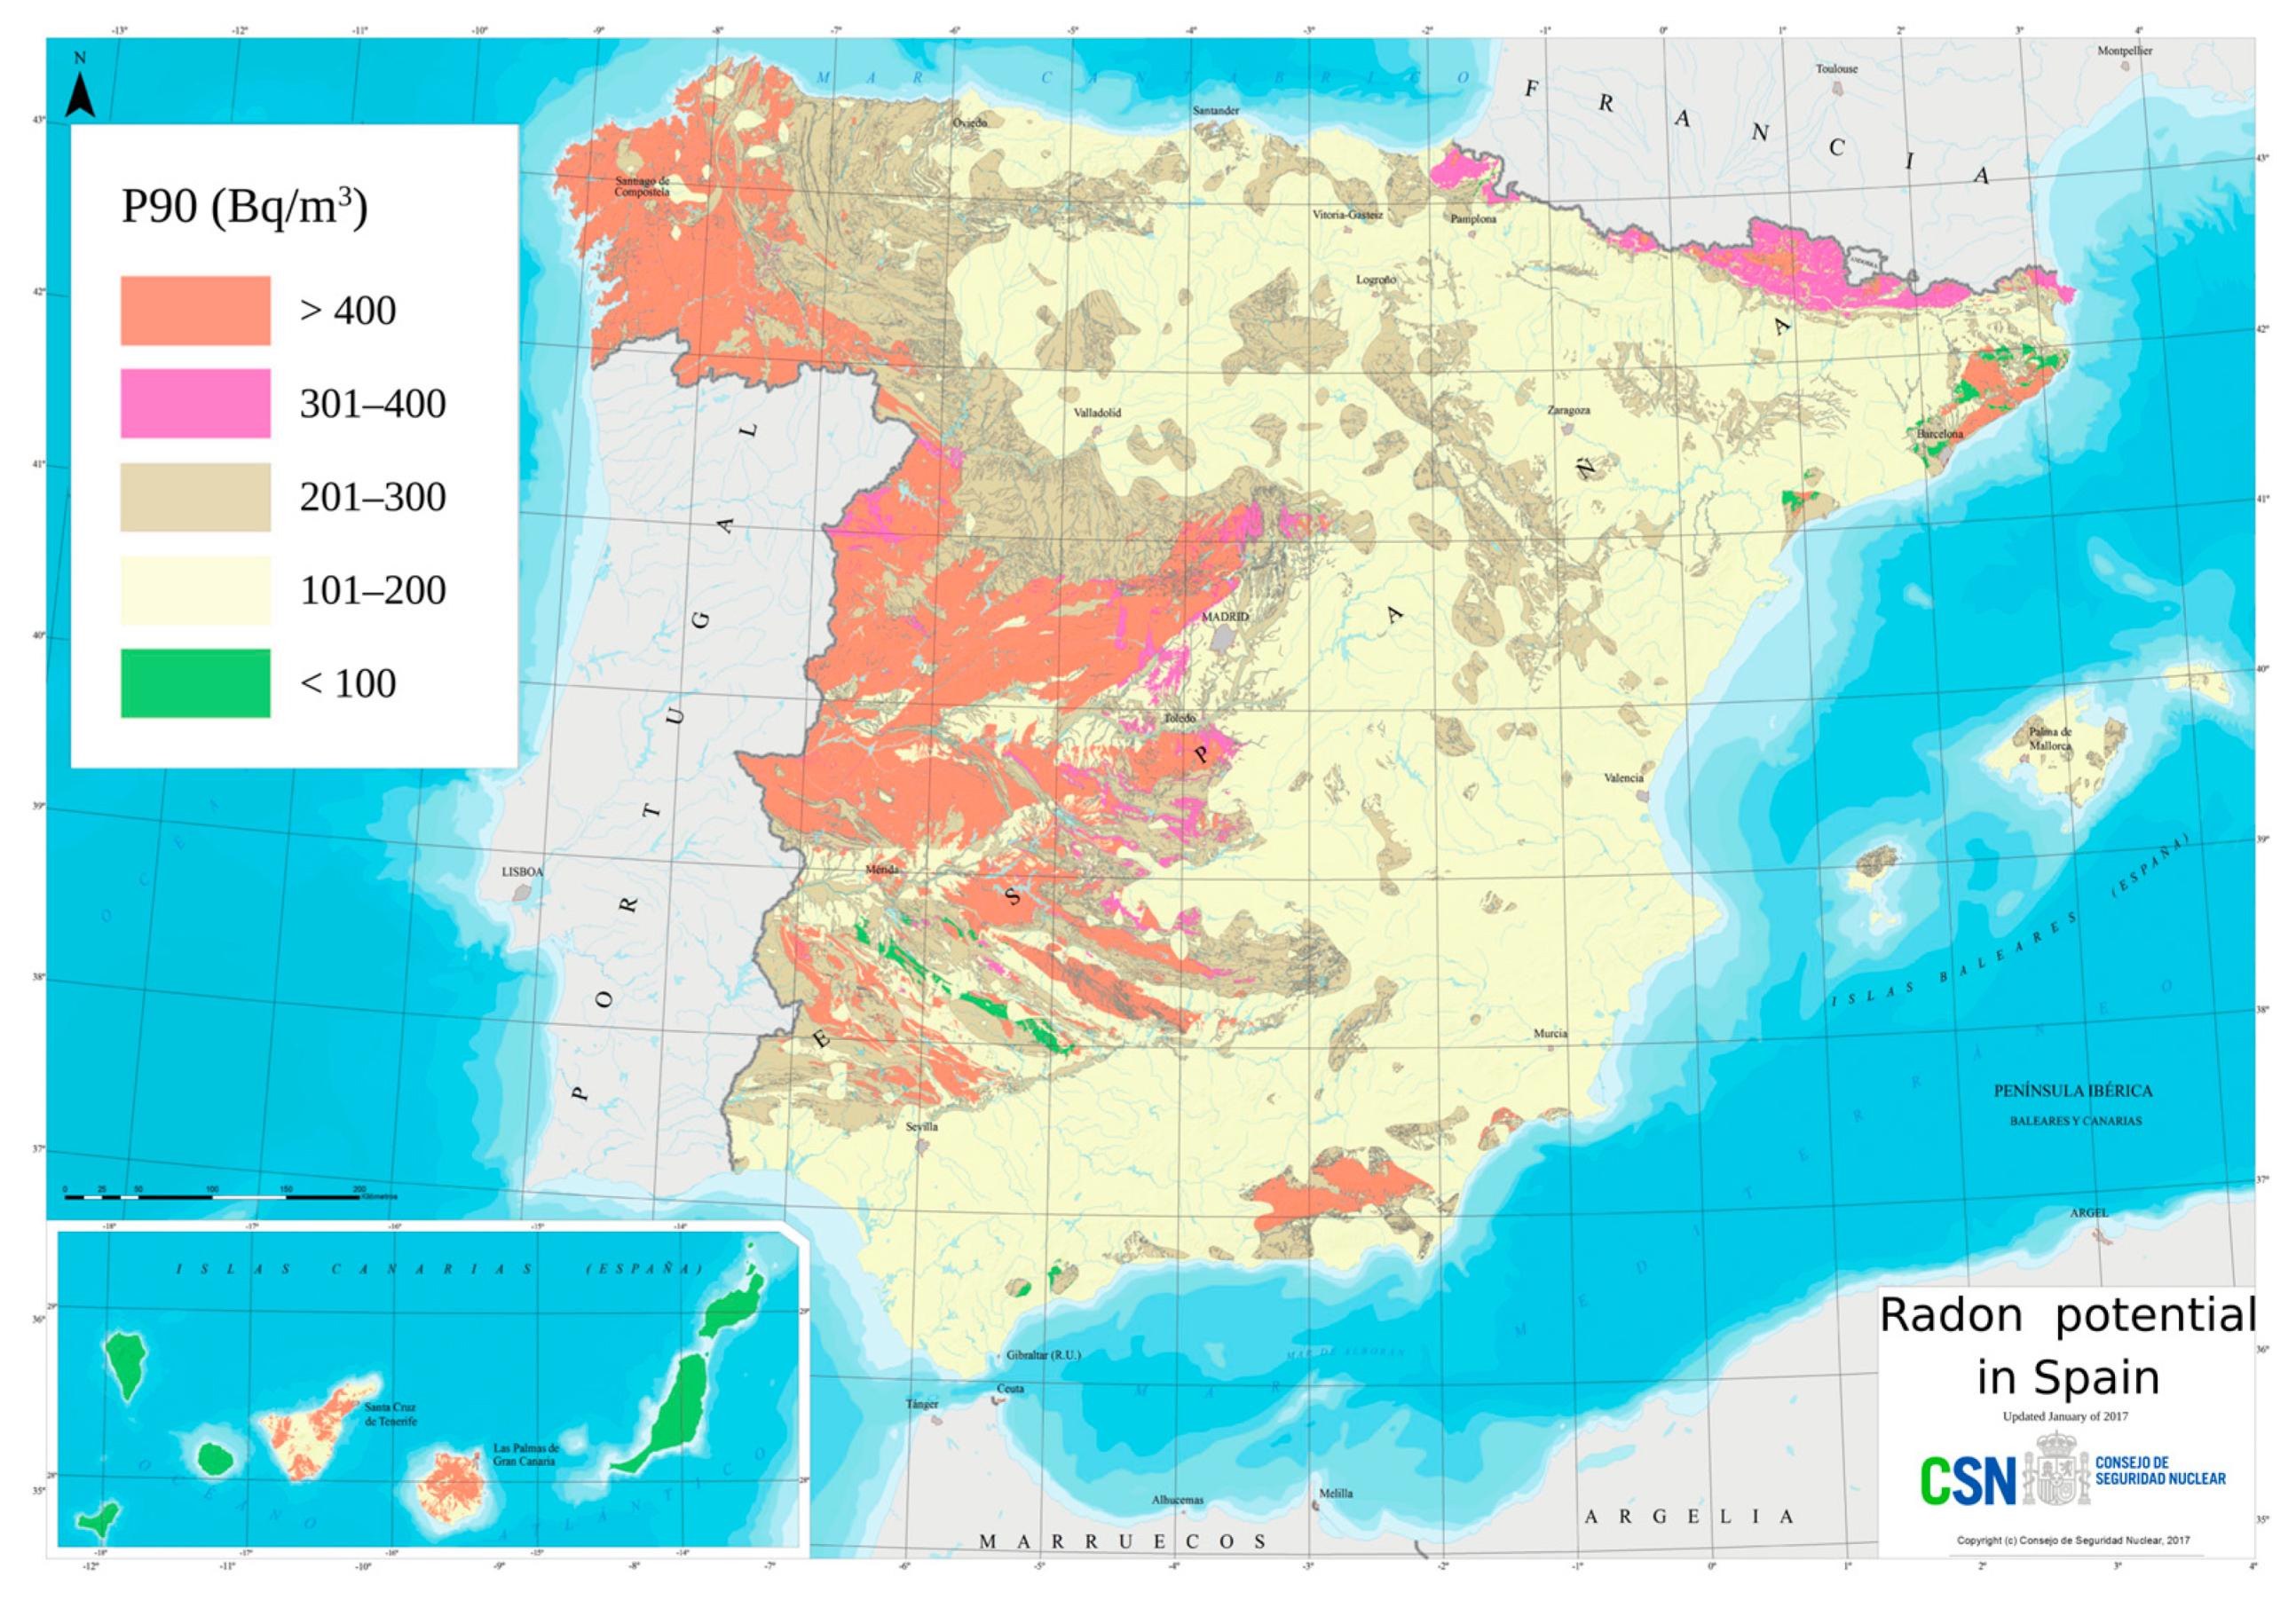 Mapa Del Radon En Espana.Sensors Free Full Text Developing A Secure Low Cost Radon Monitoring System Html